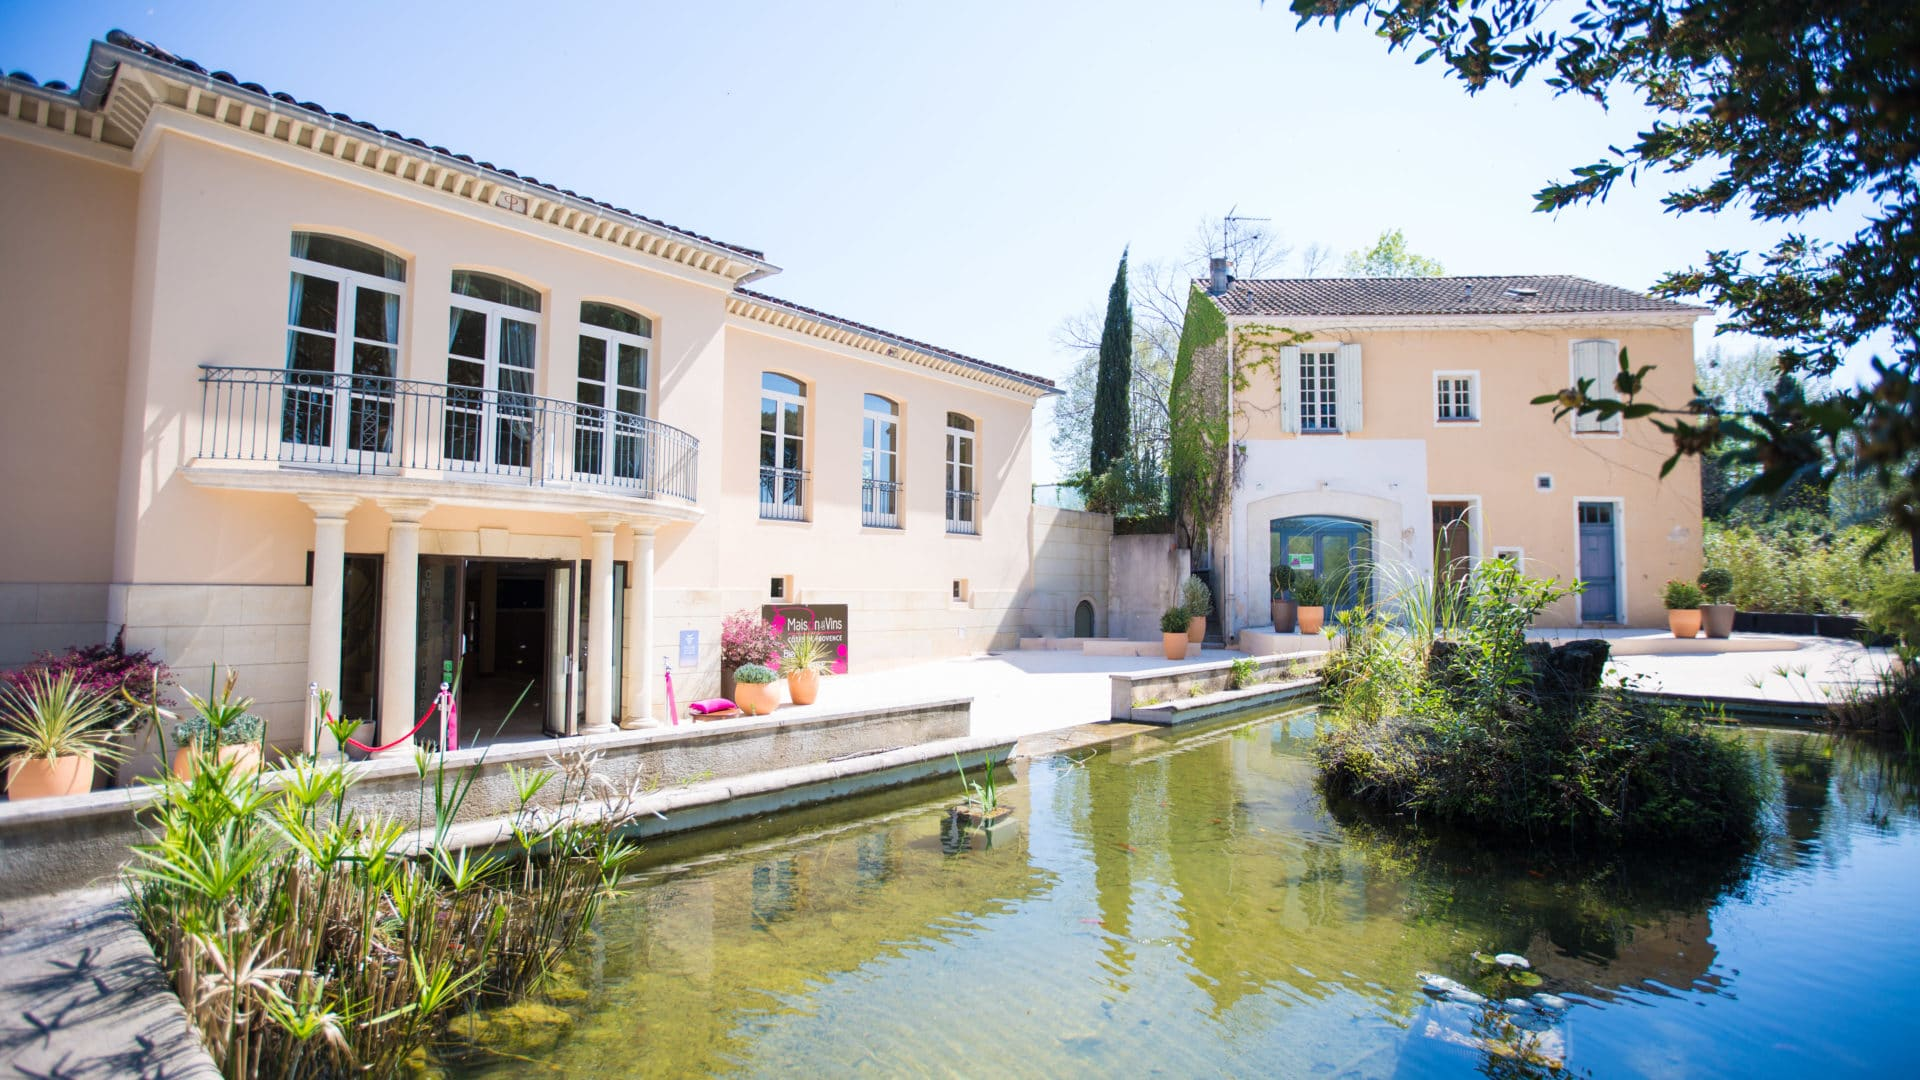 Hus av Provence wines